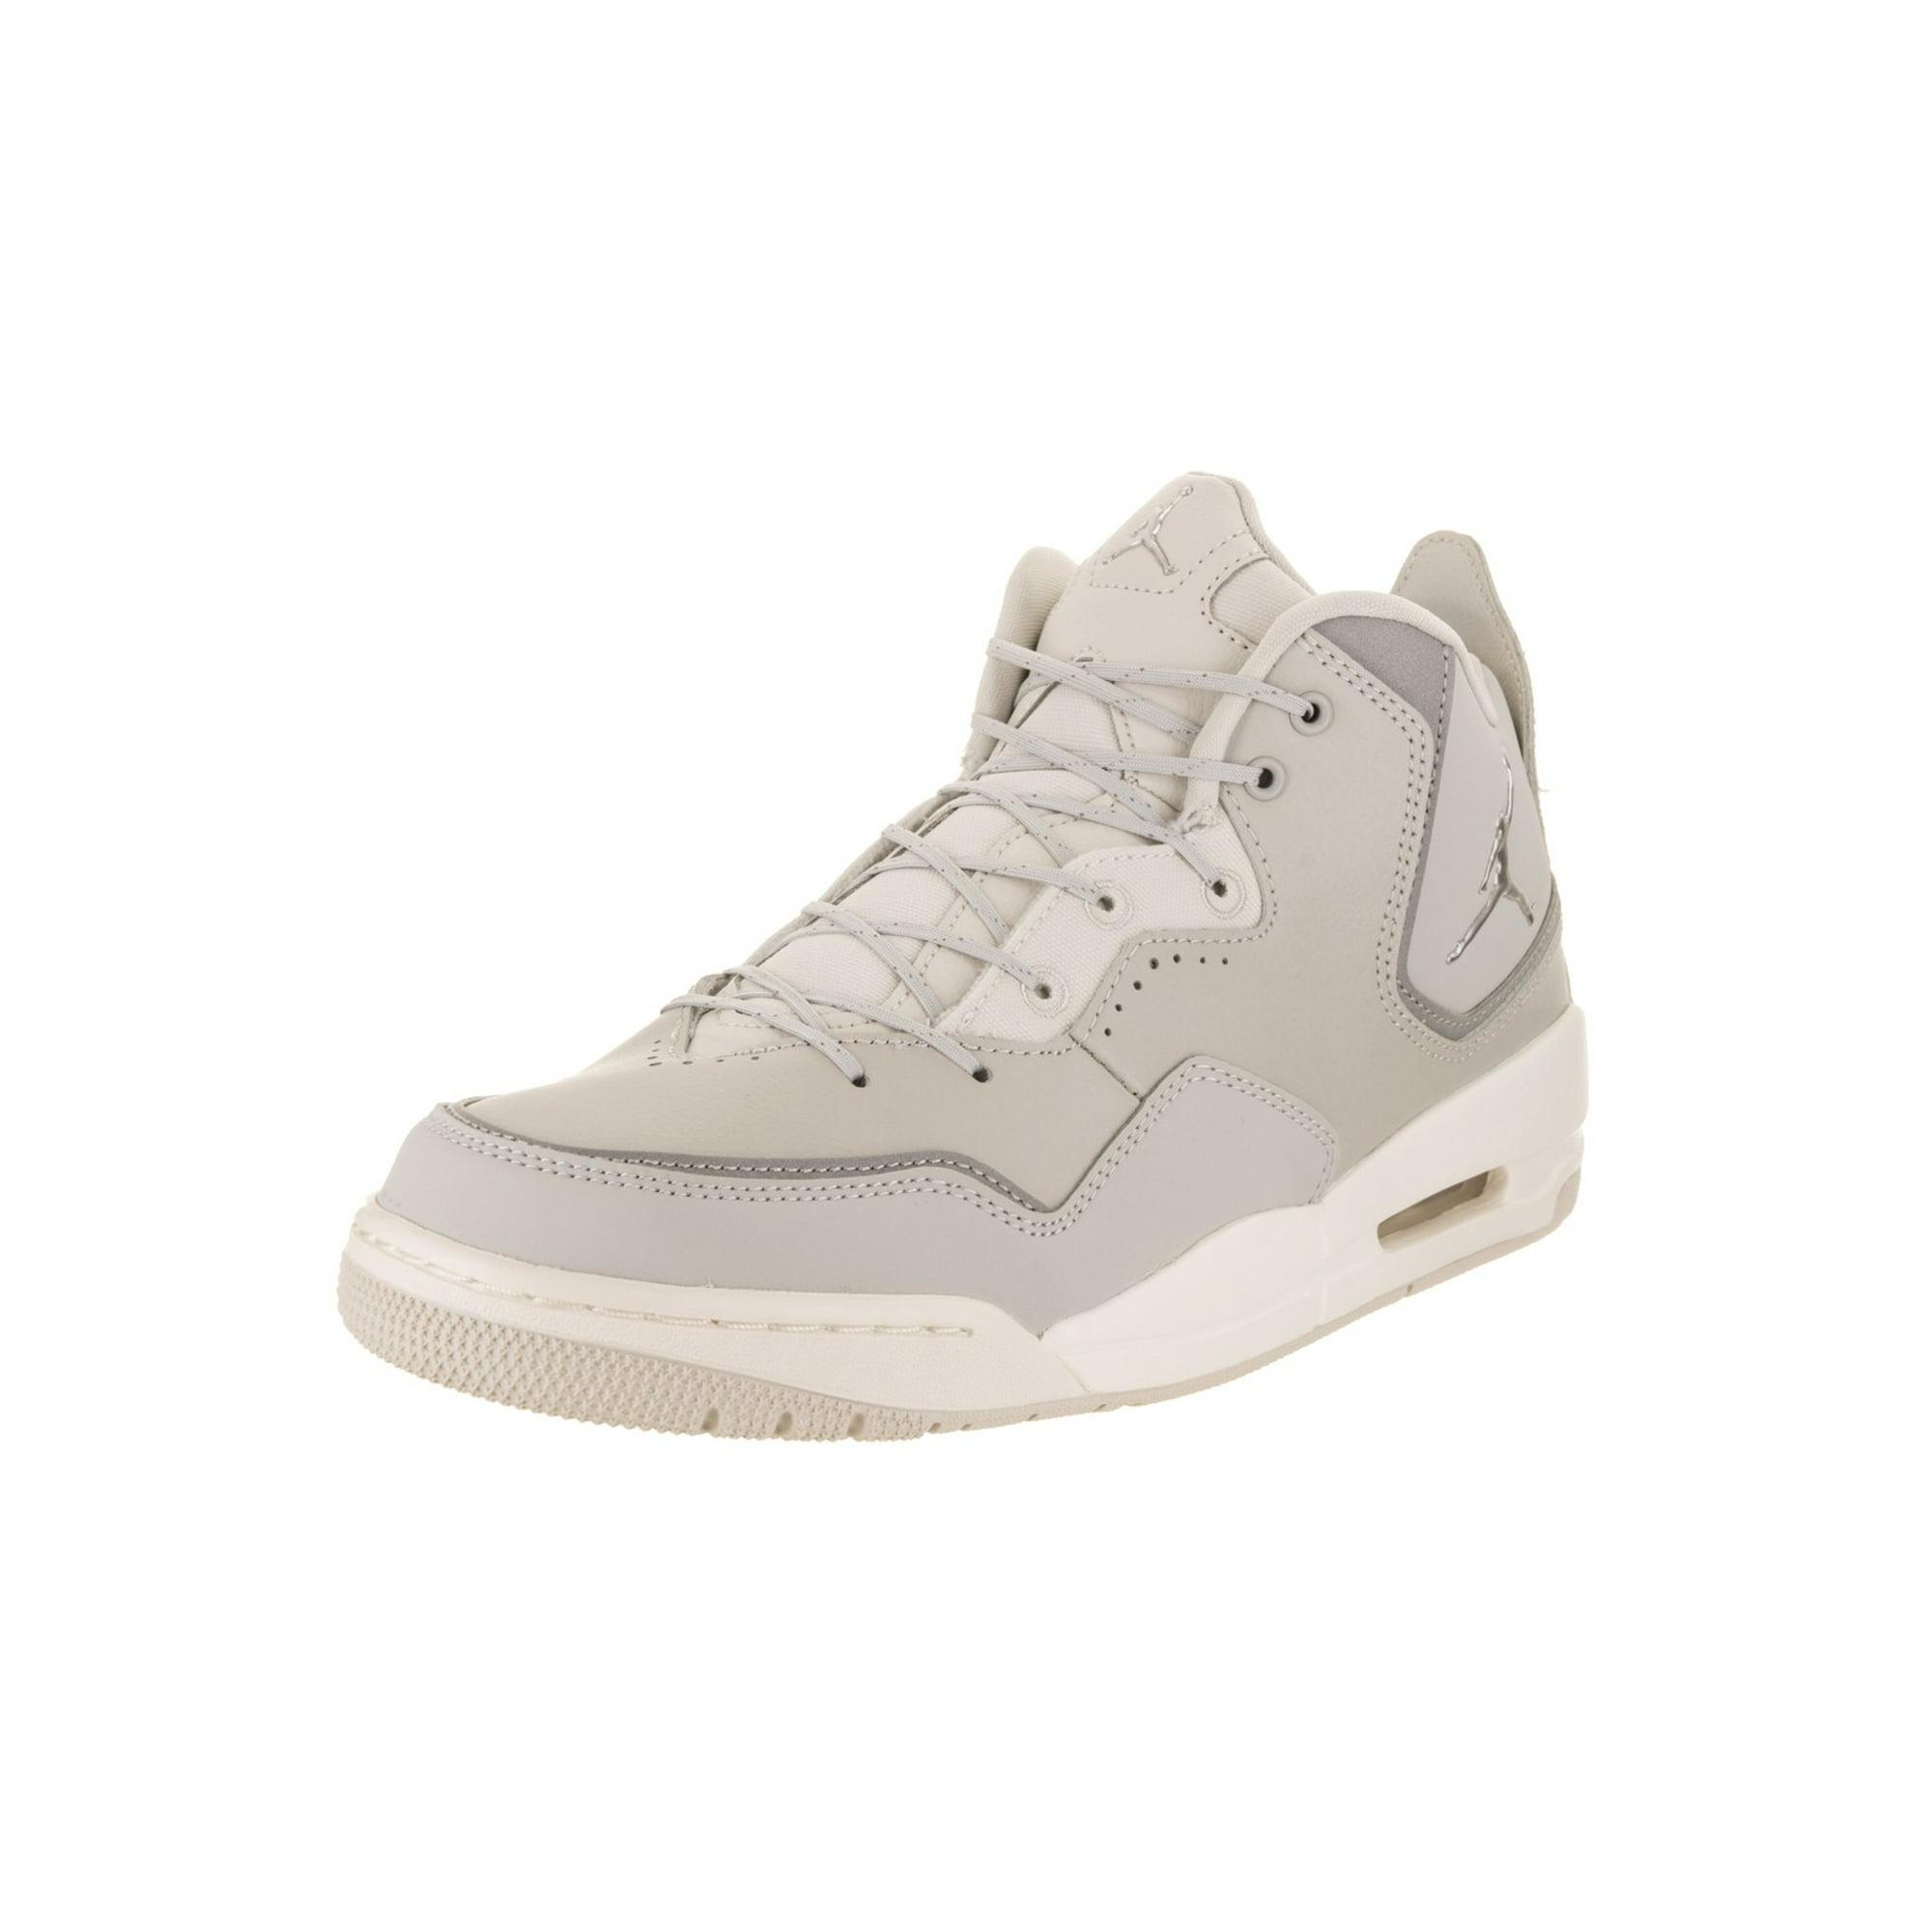 07811c69f4d40a Nike Jordan Men s Jordan Courtside 23 Basketball Shoe